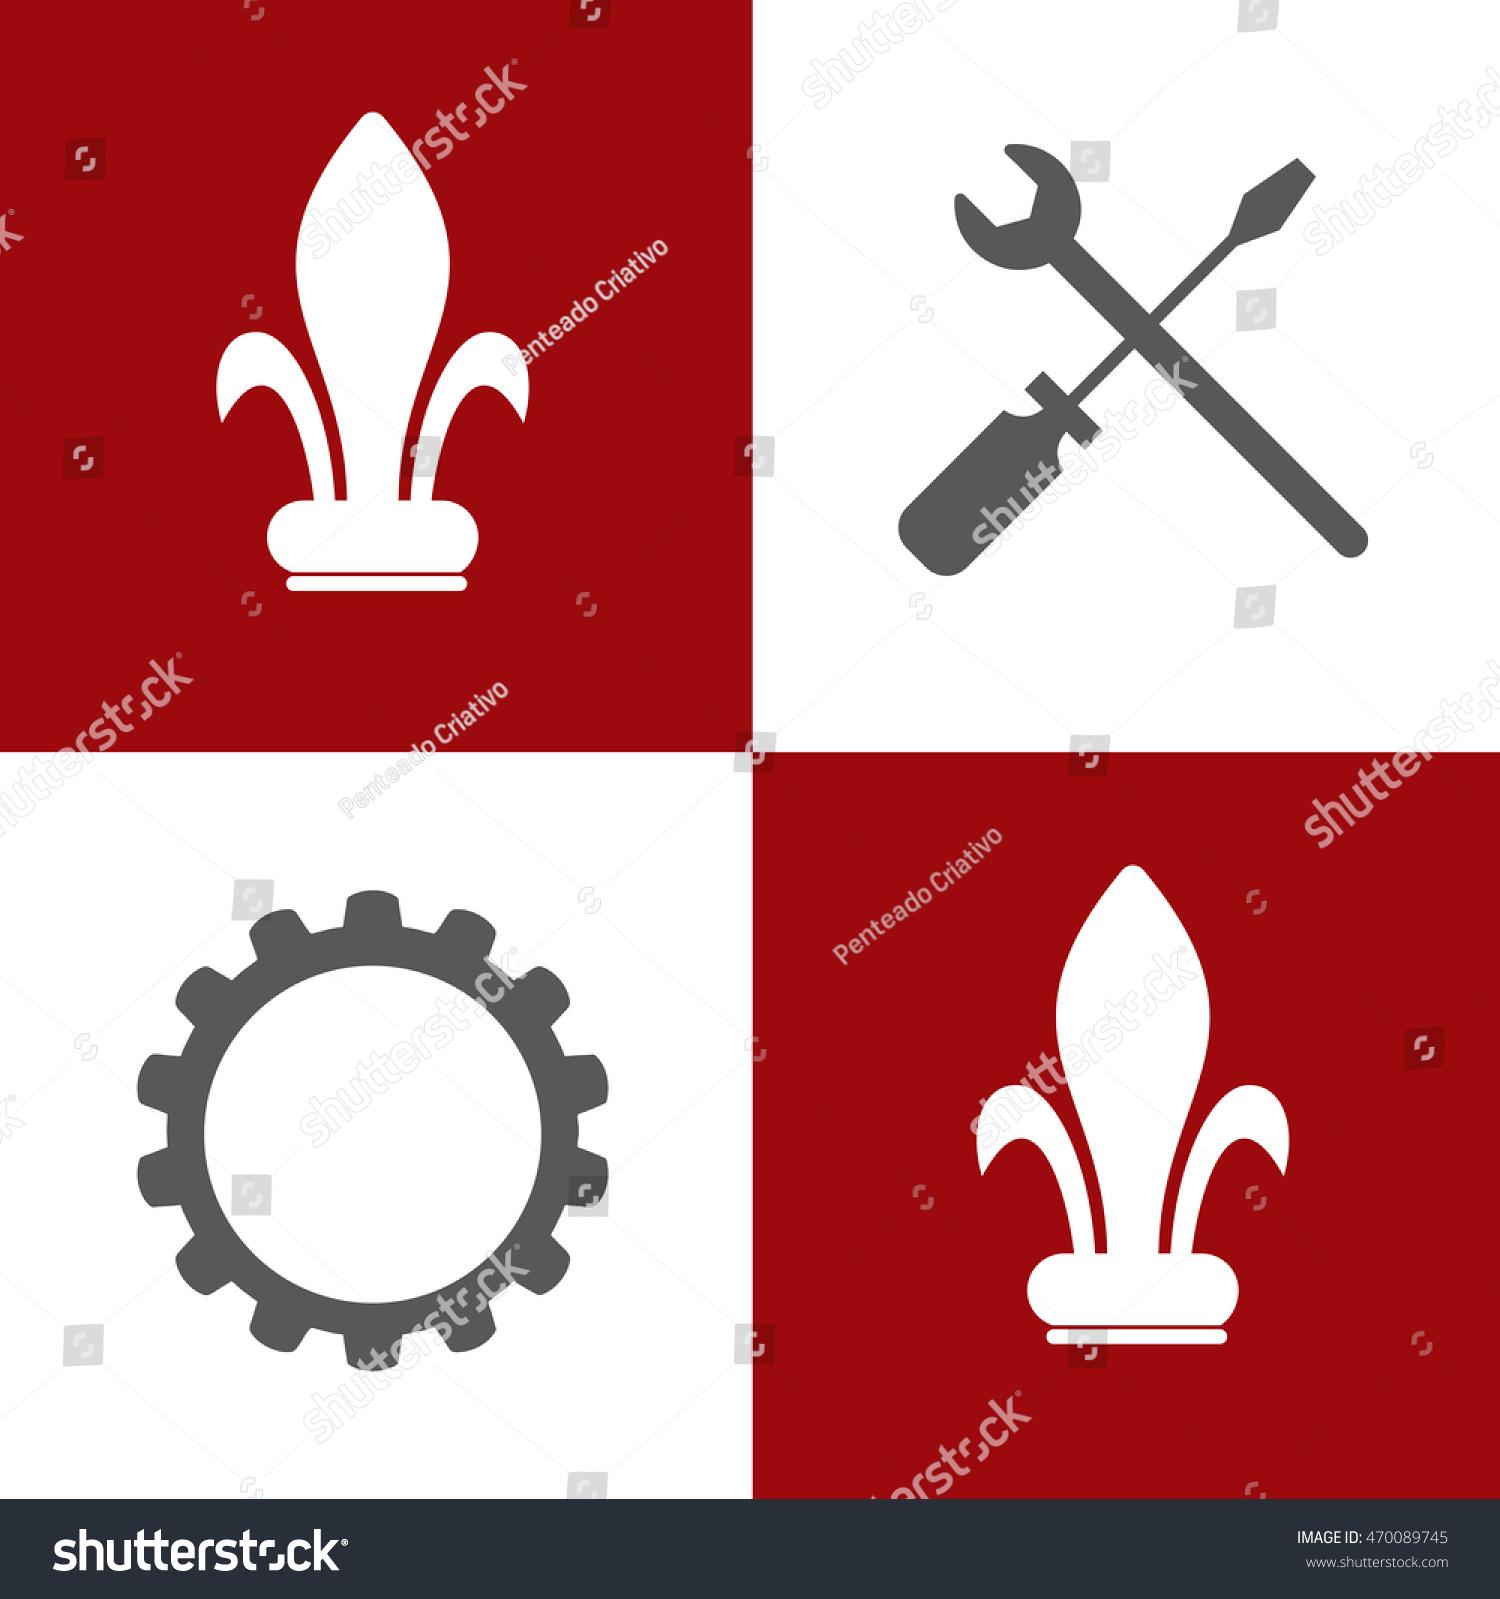 auto repair shop symbol vector illustration stock vector royalty rh shutterstock com auto repair shop logo vector free download Auto Repair Shop Signs